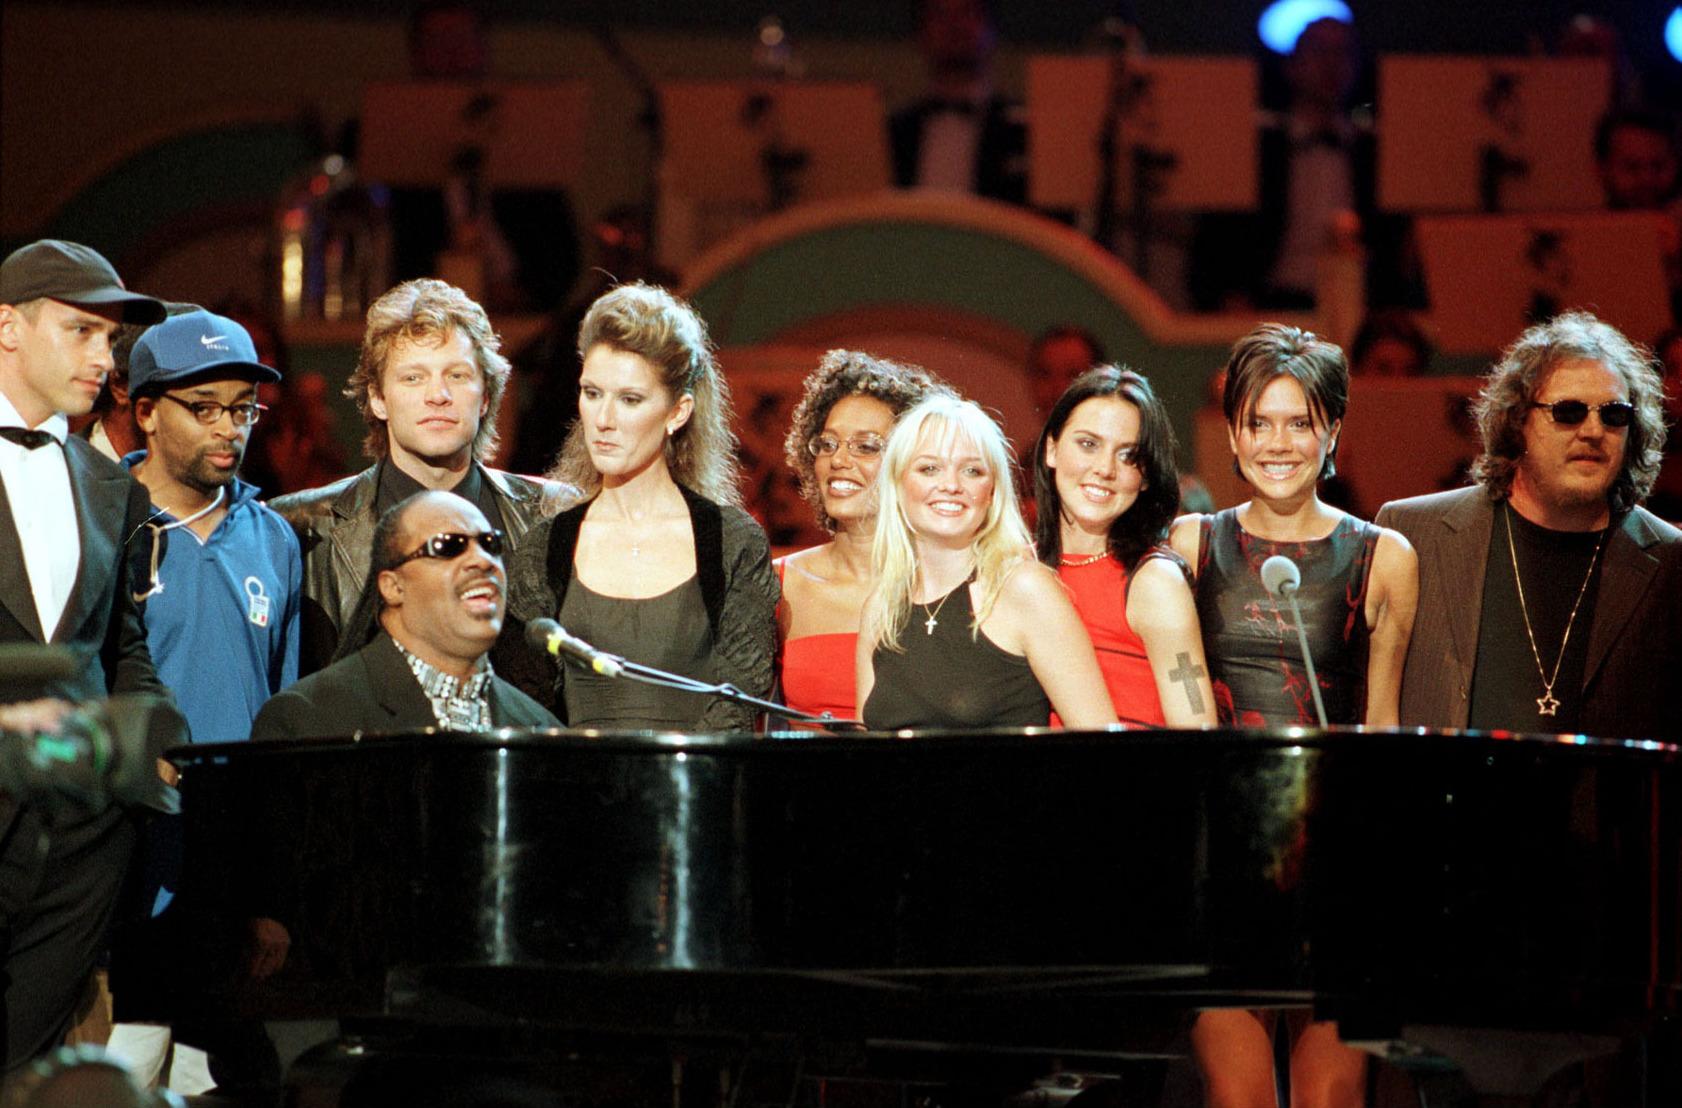 Eros Ramazzotti, Spike Lee, Bon Jovi, Celine Dion, Spice Girl, Zucchero